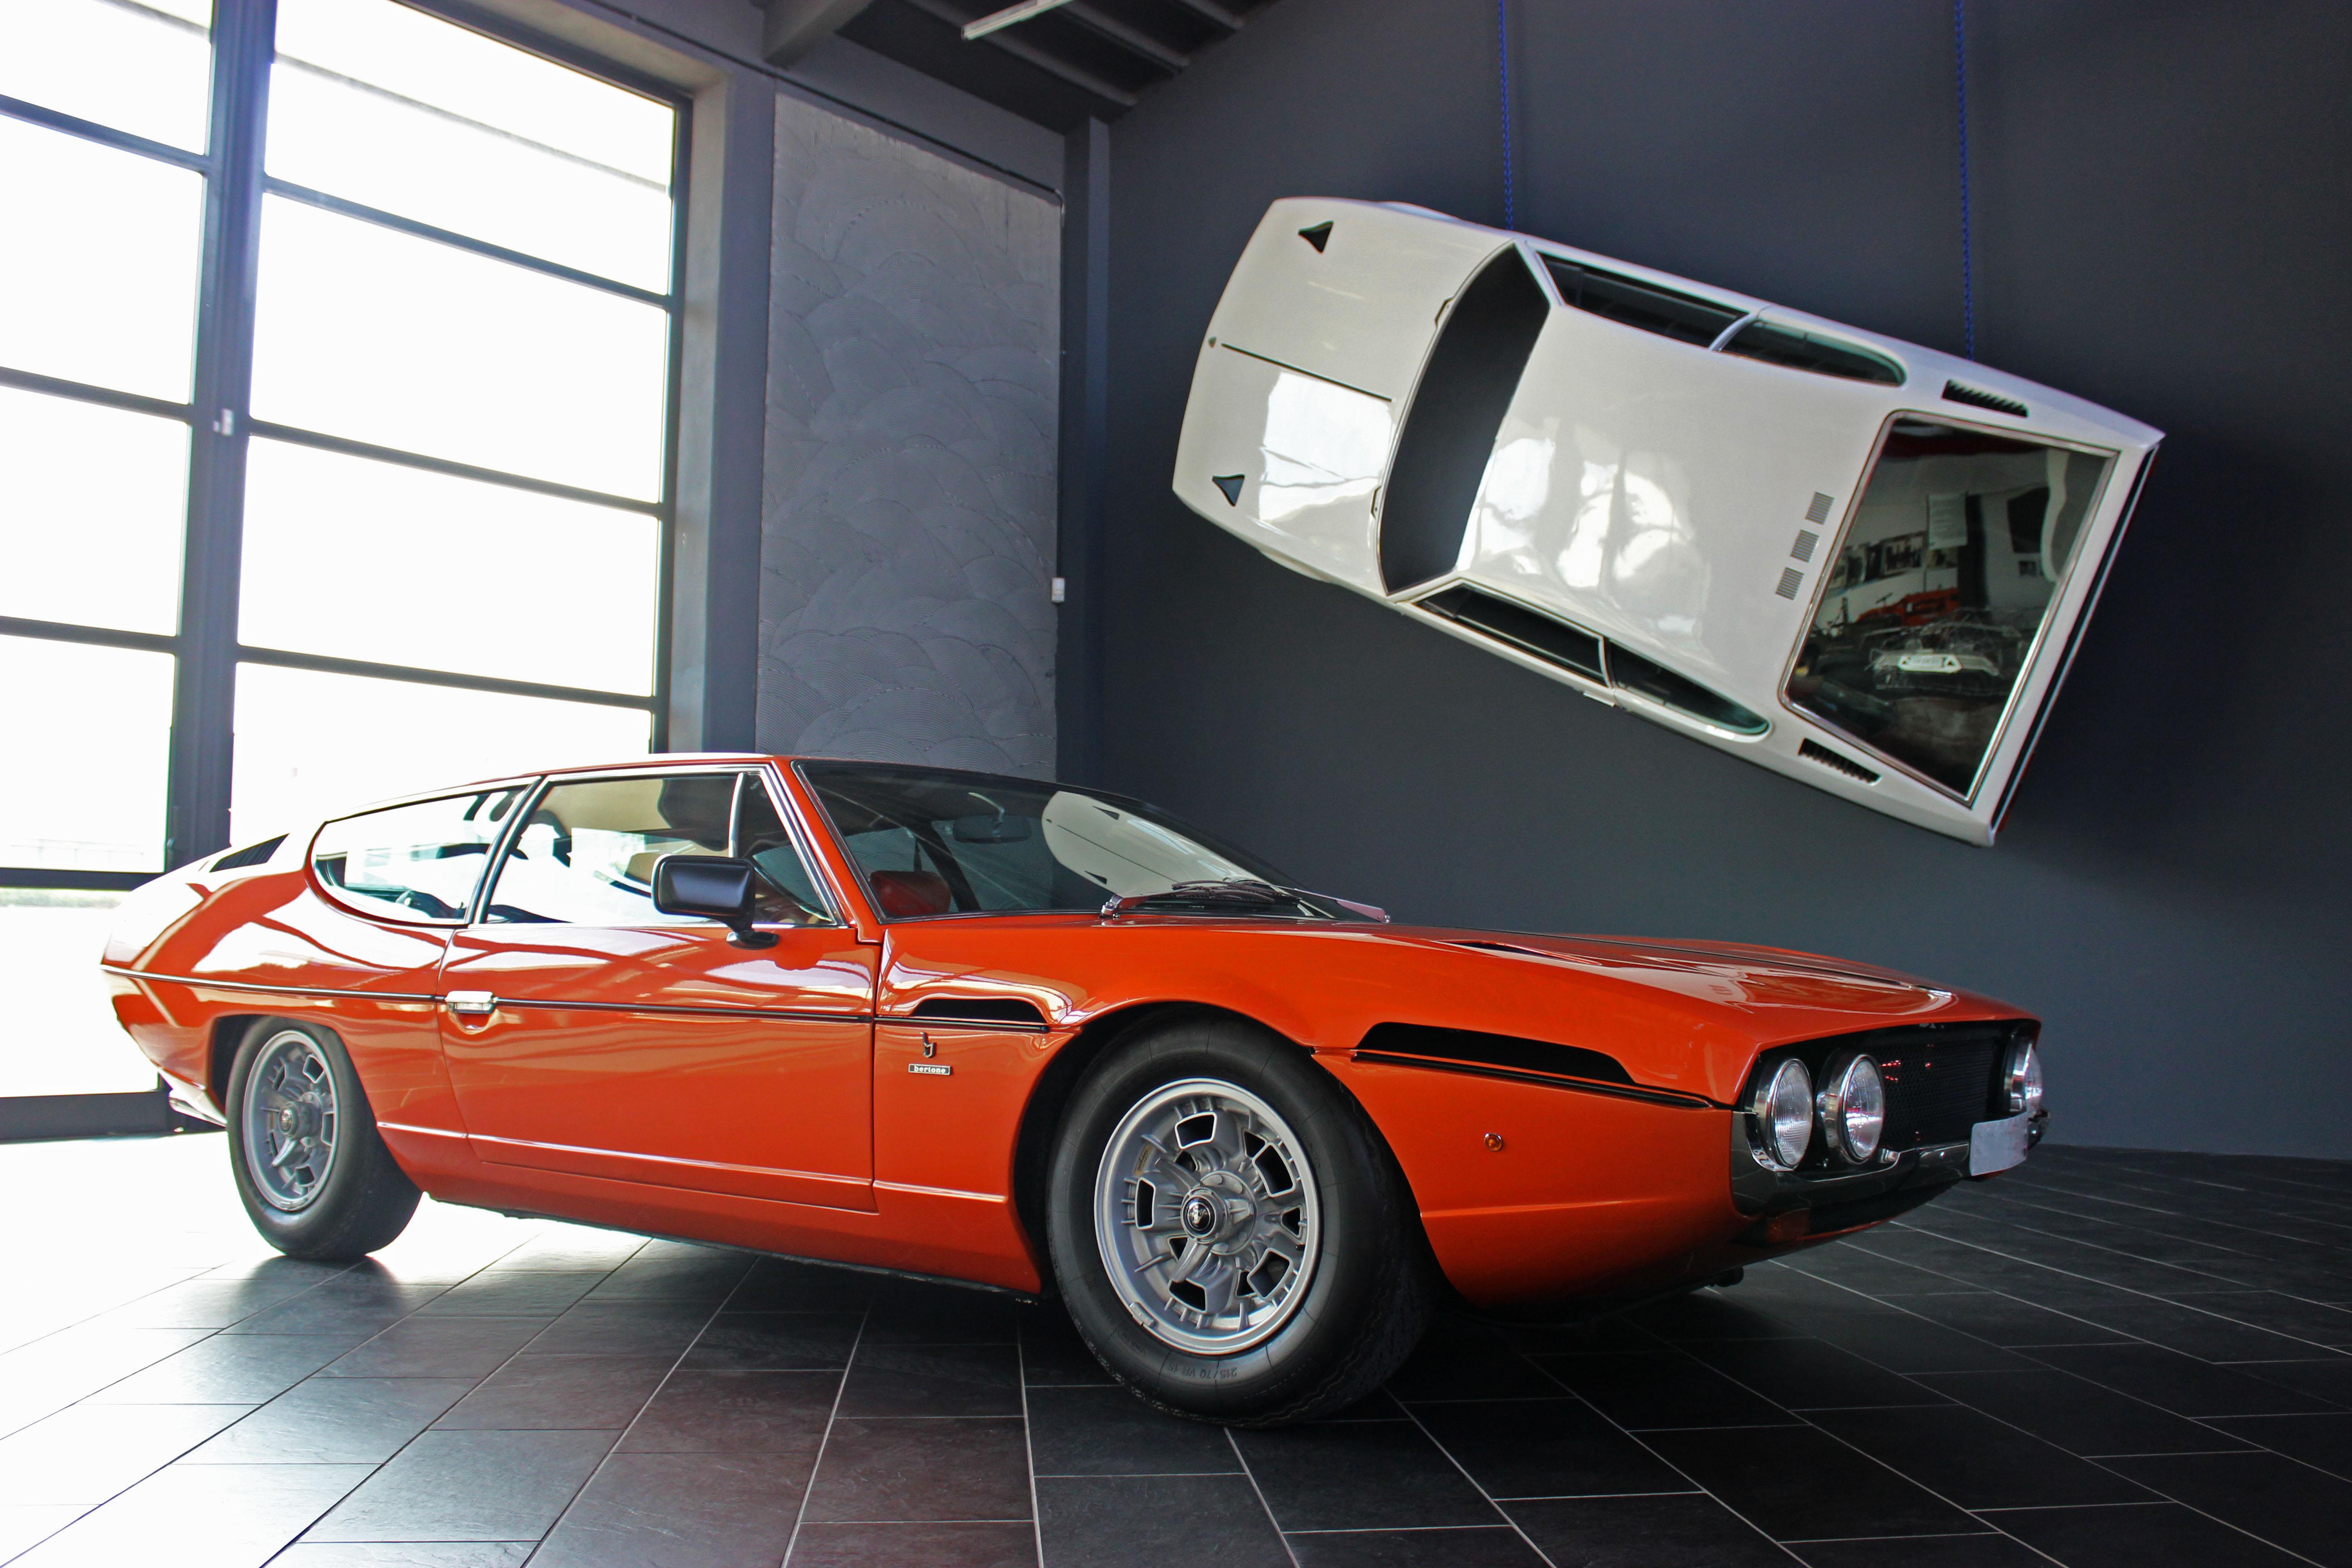 Lamborghini Espada Vip At Ferruccio Lamborghini Museum Ferruccio